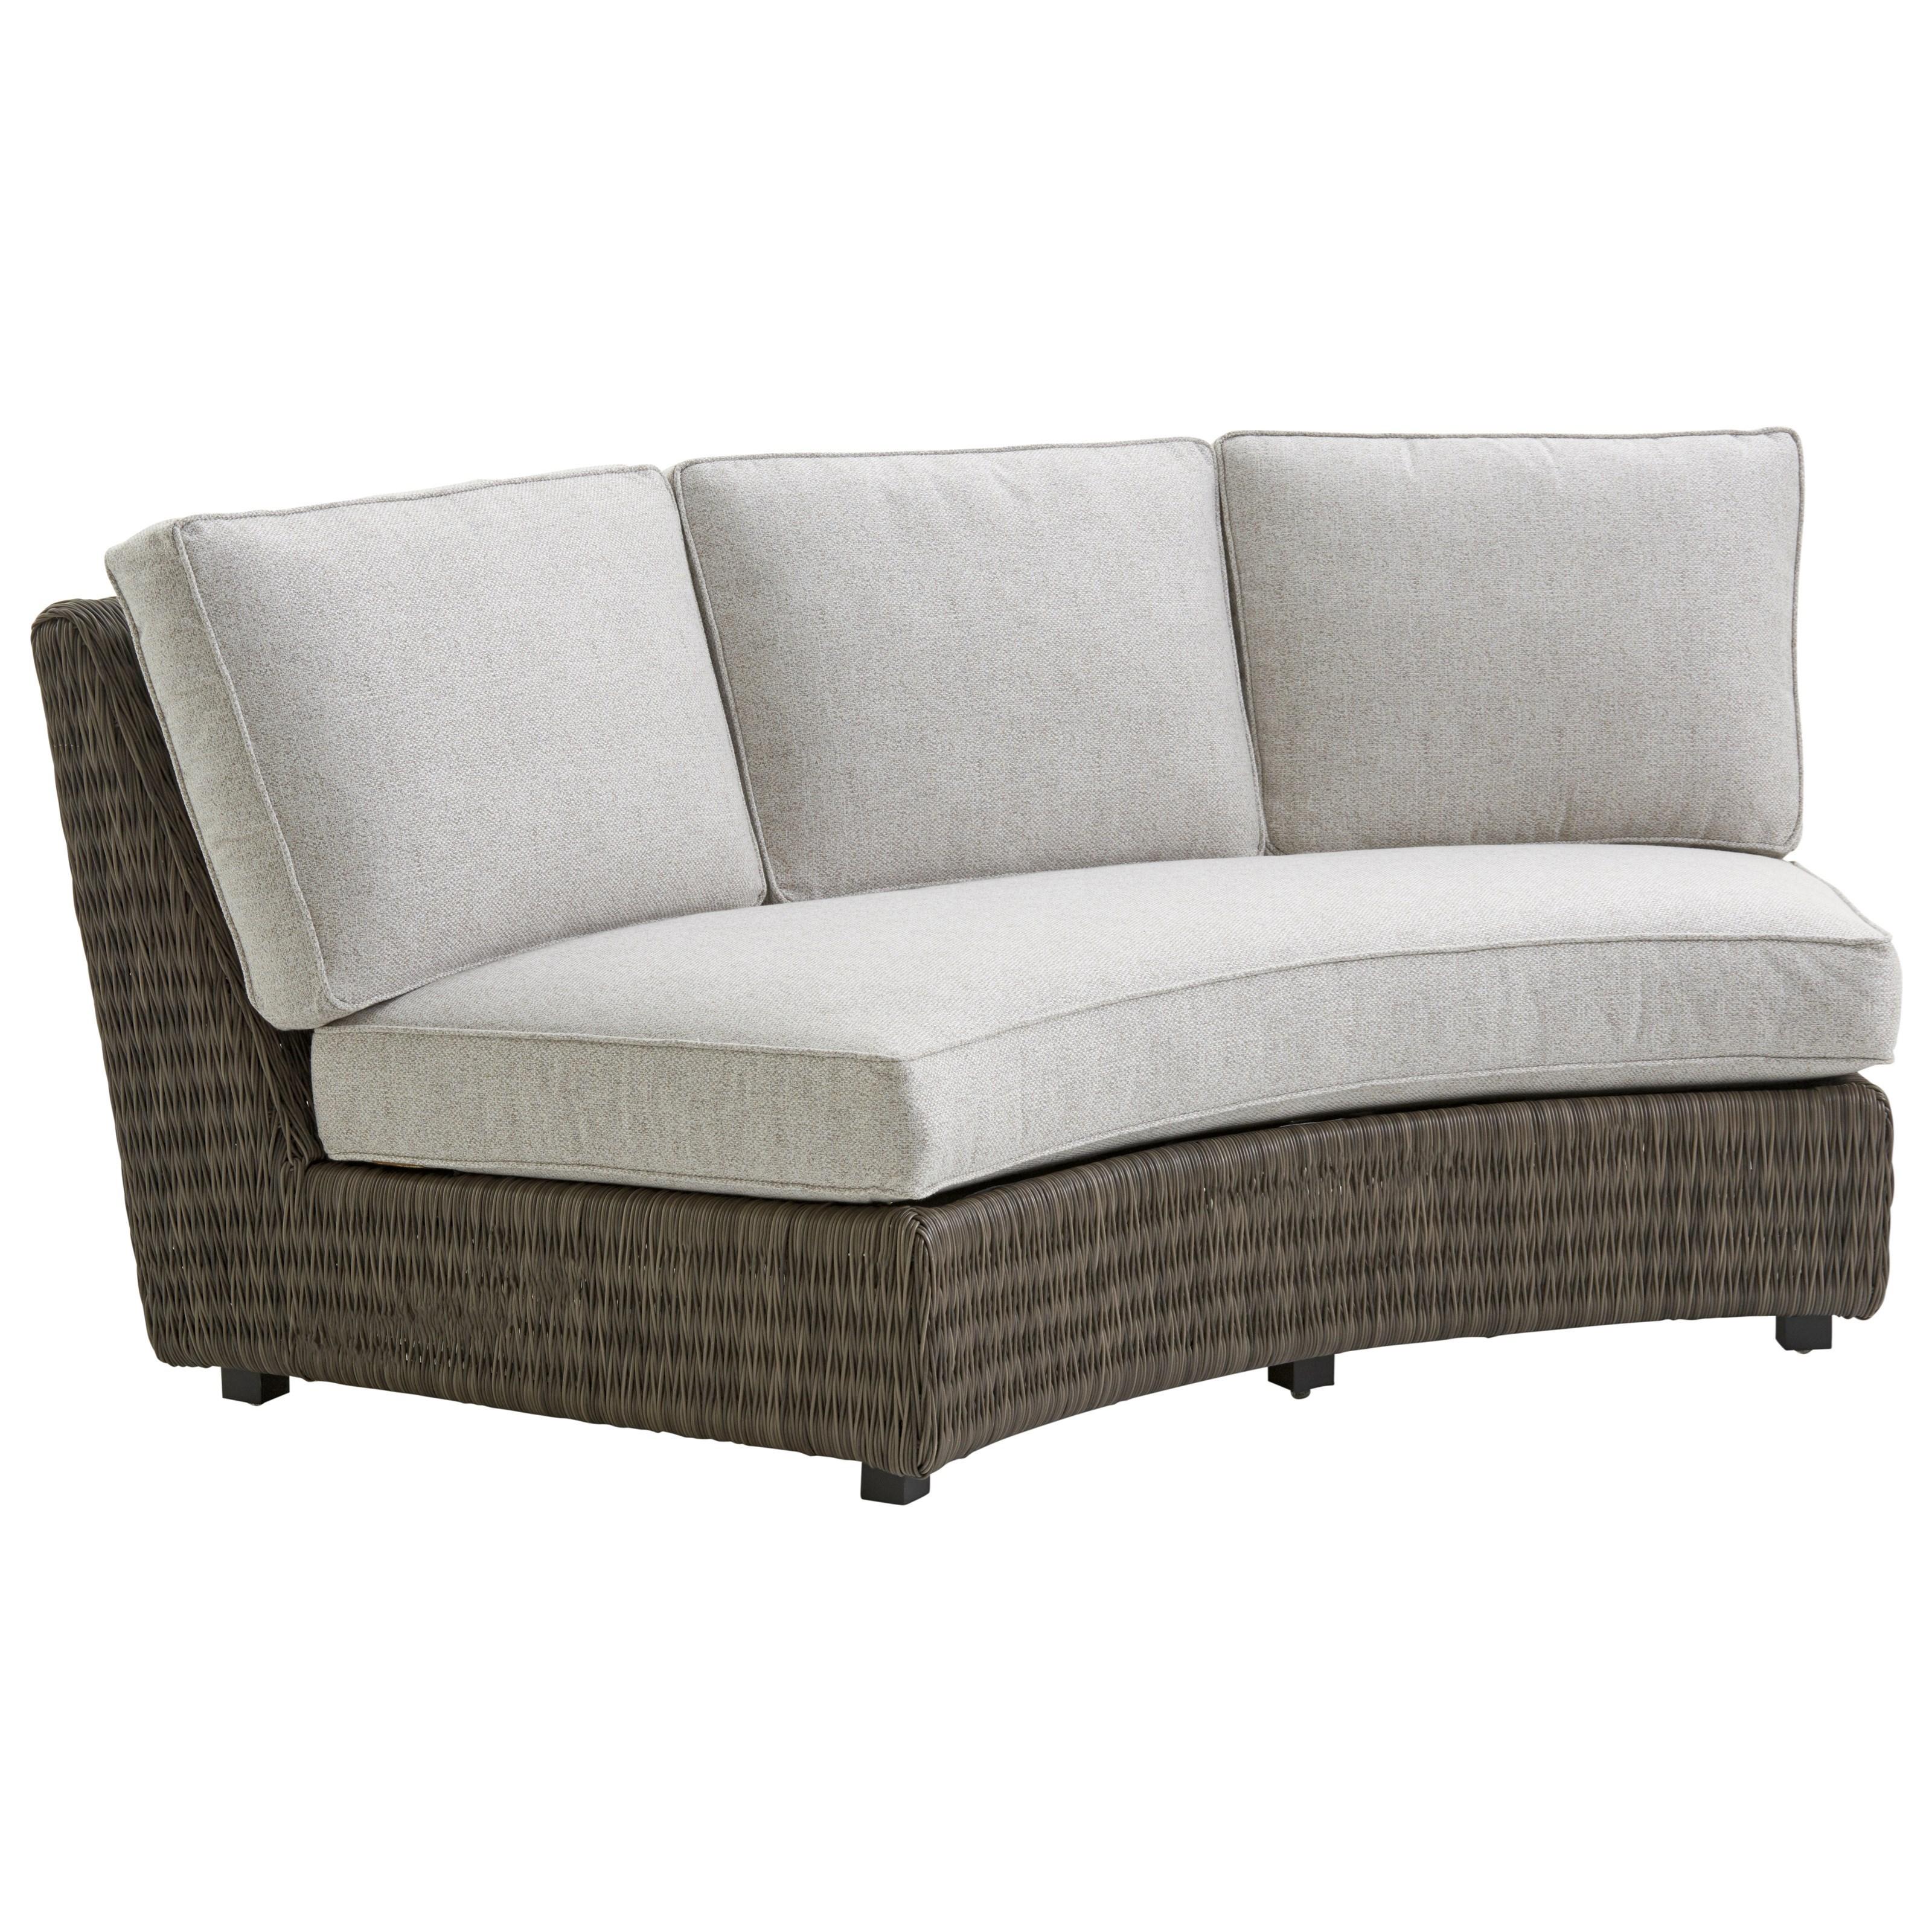 Outdoor Armless Sofa w/ Box Cushions